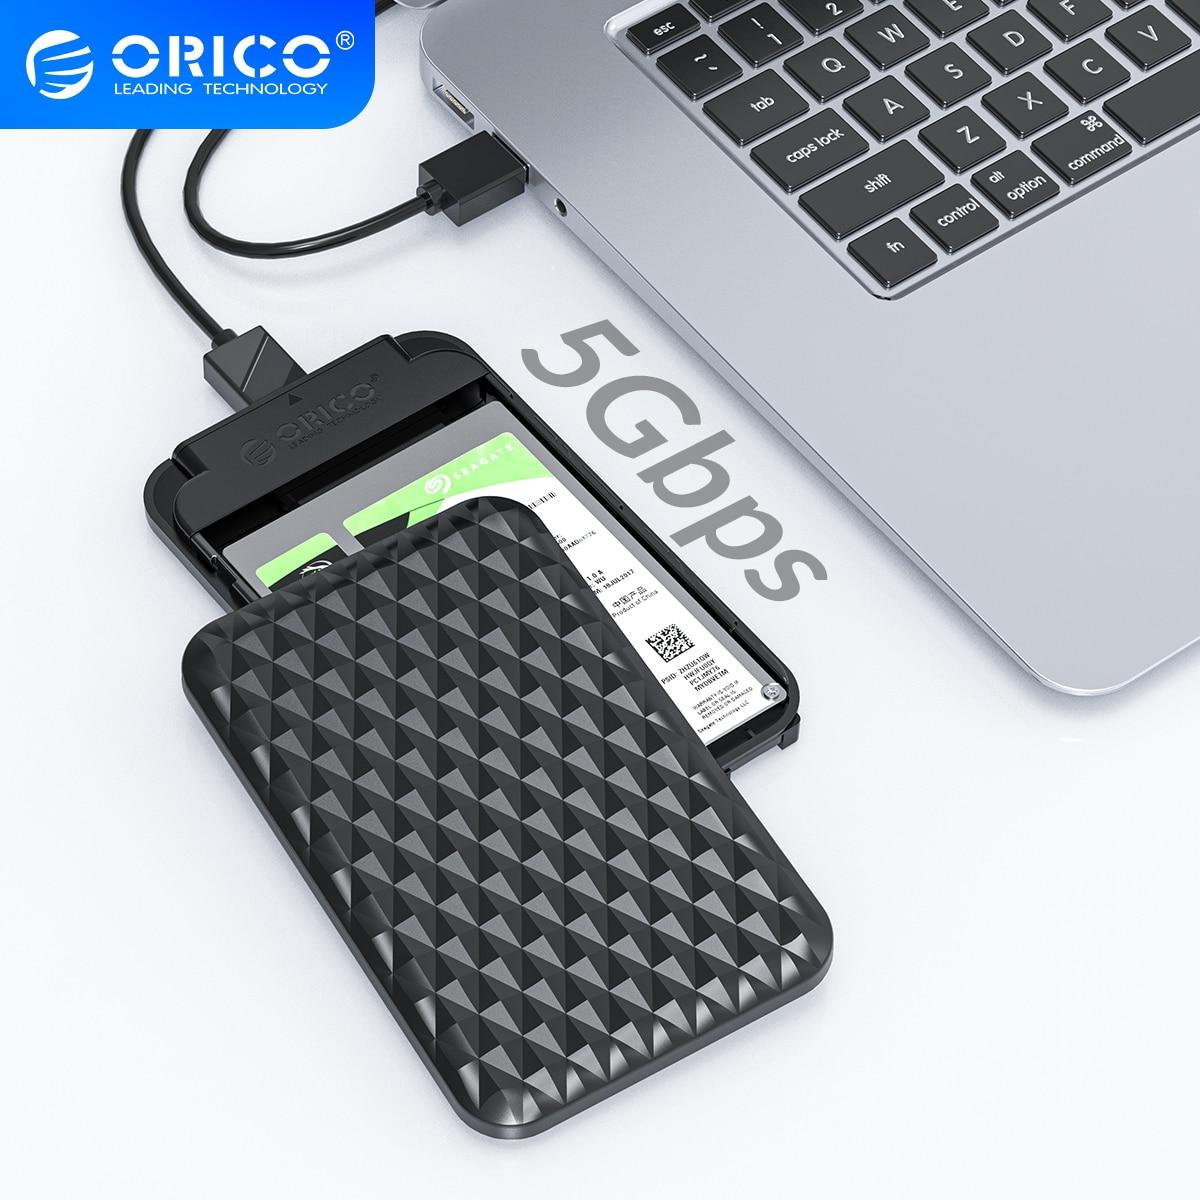 Чехол ORICO для жесткого диска 2,5 дюйма, SATA к USB 3,0, 5 Гбит/с, 4 ТБ корпус SSD, HDD Поддержка UASP Внешний HD чехол, коробка для жесткого диска 7-9,5 мм HDD | Компьютеры и офис | АлиЭкспресс